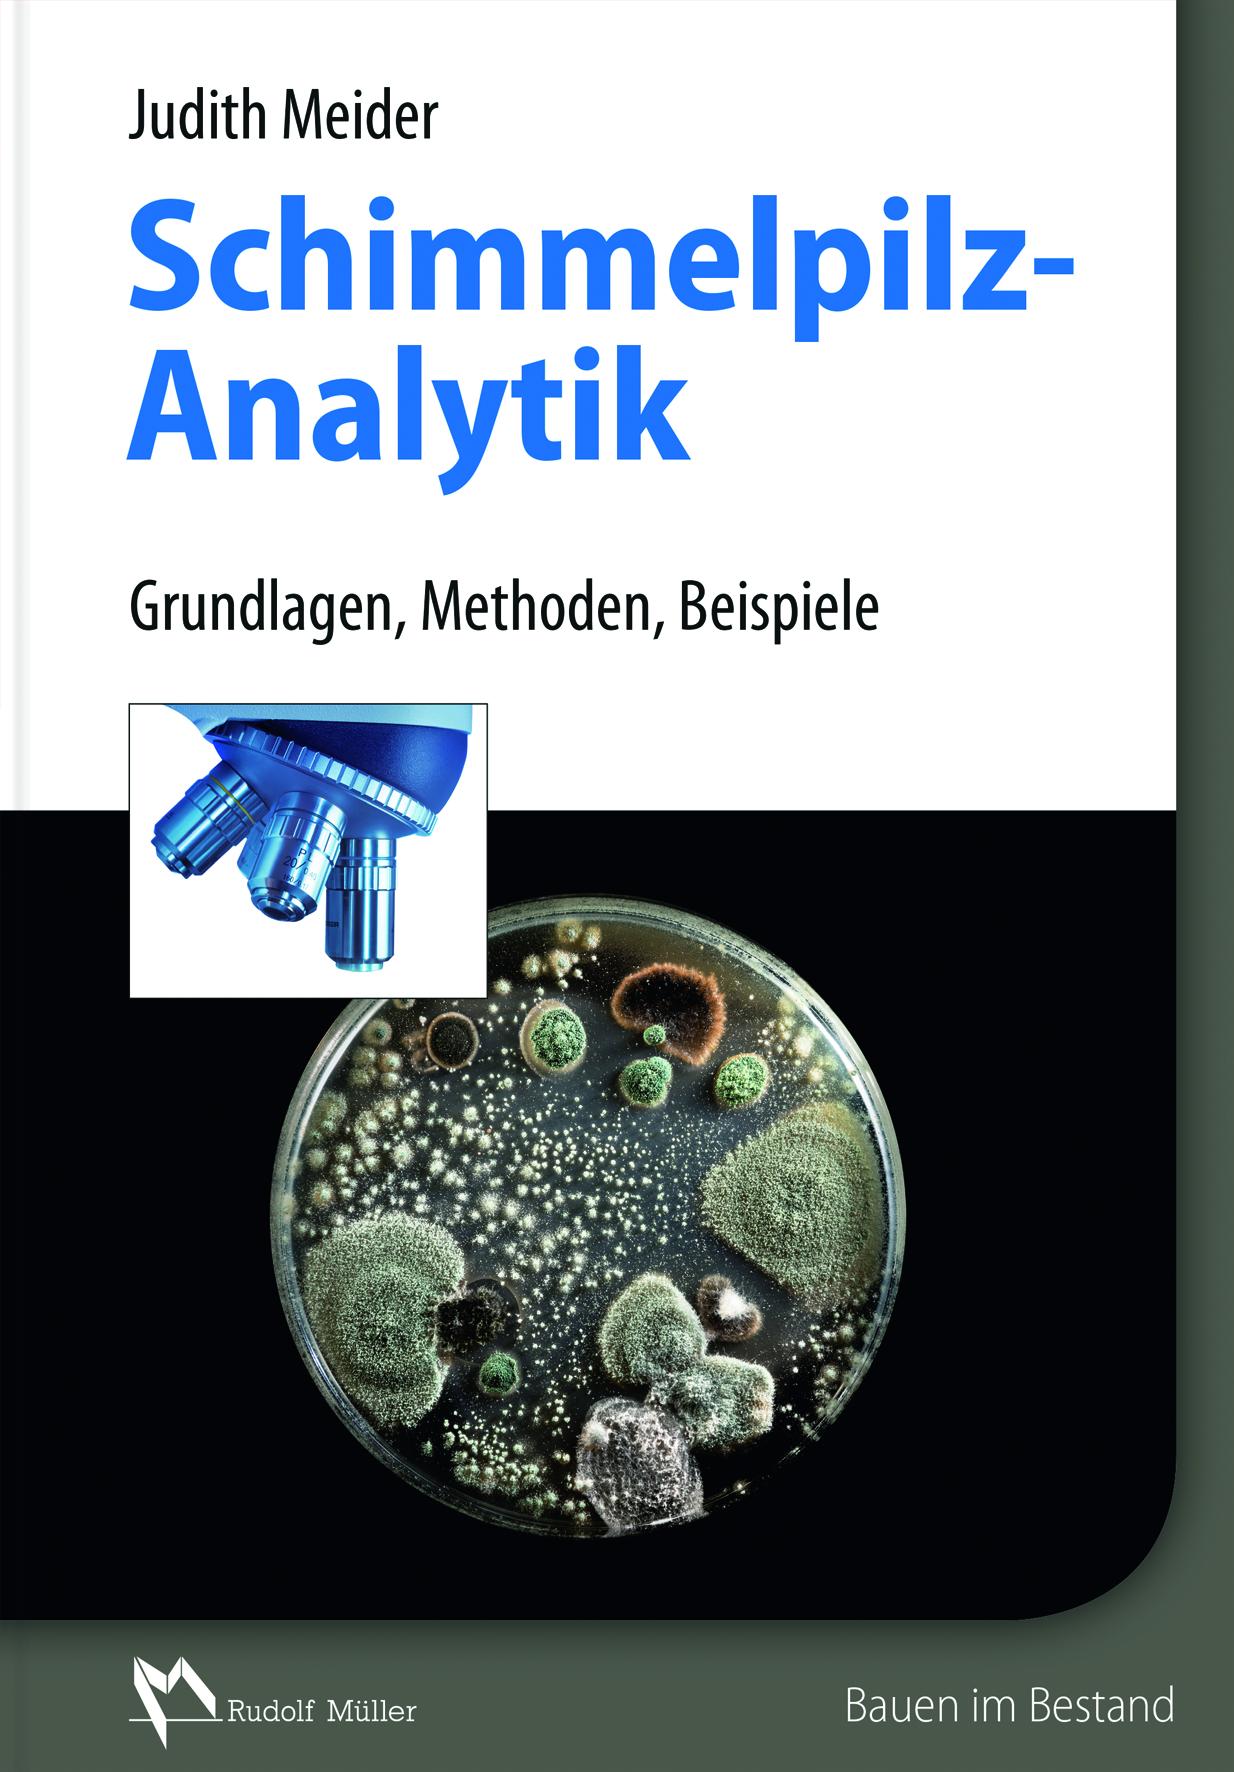 Schimmelpilzanalytik - Judith Meider -  9783481033743